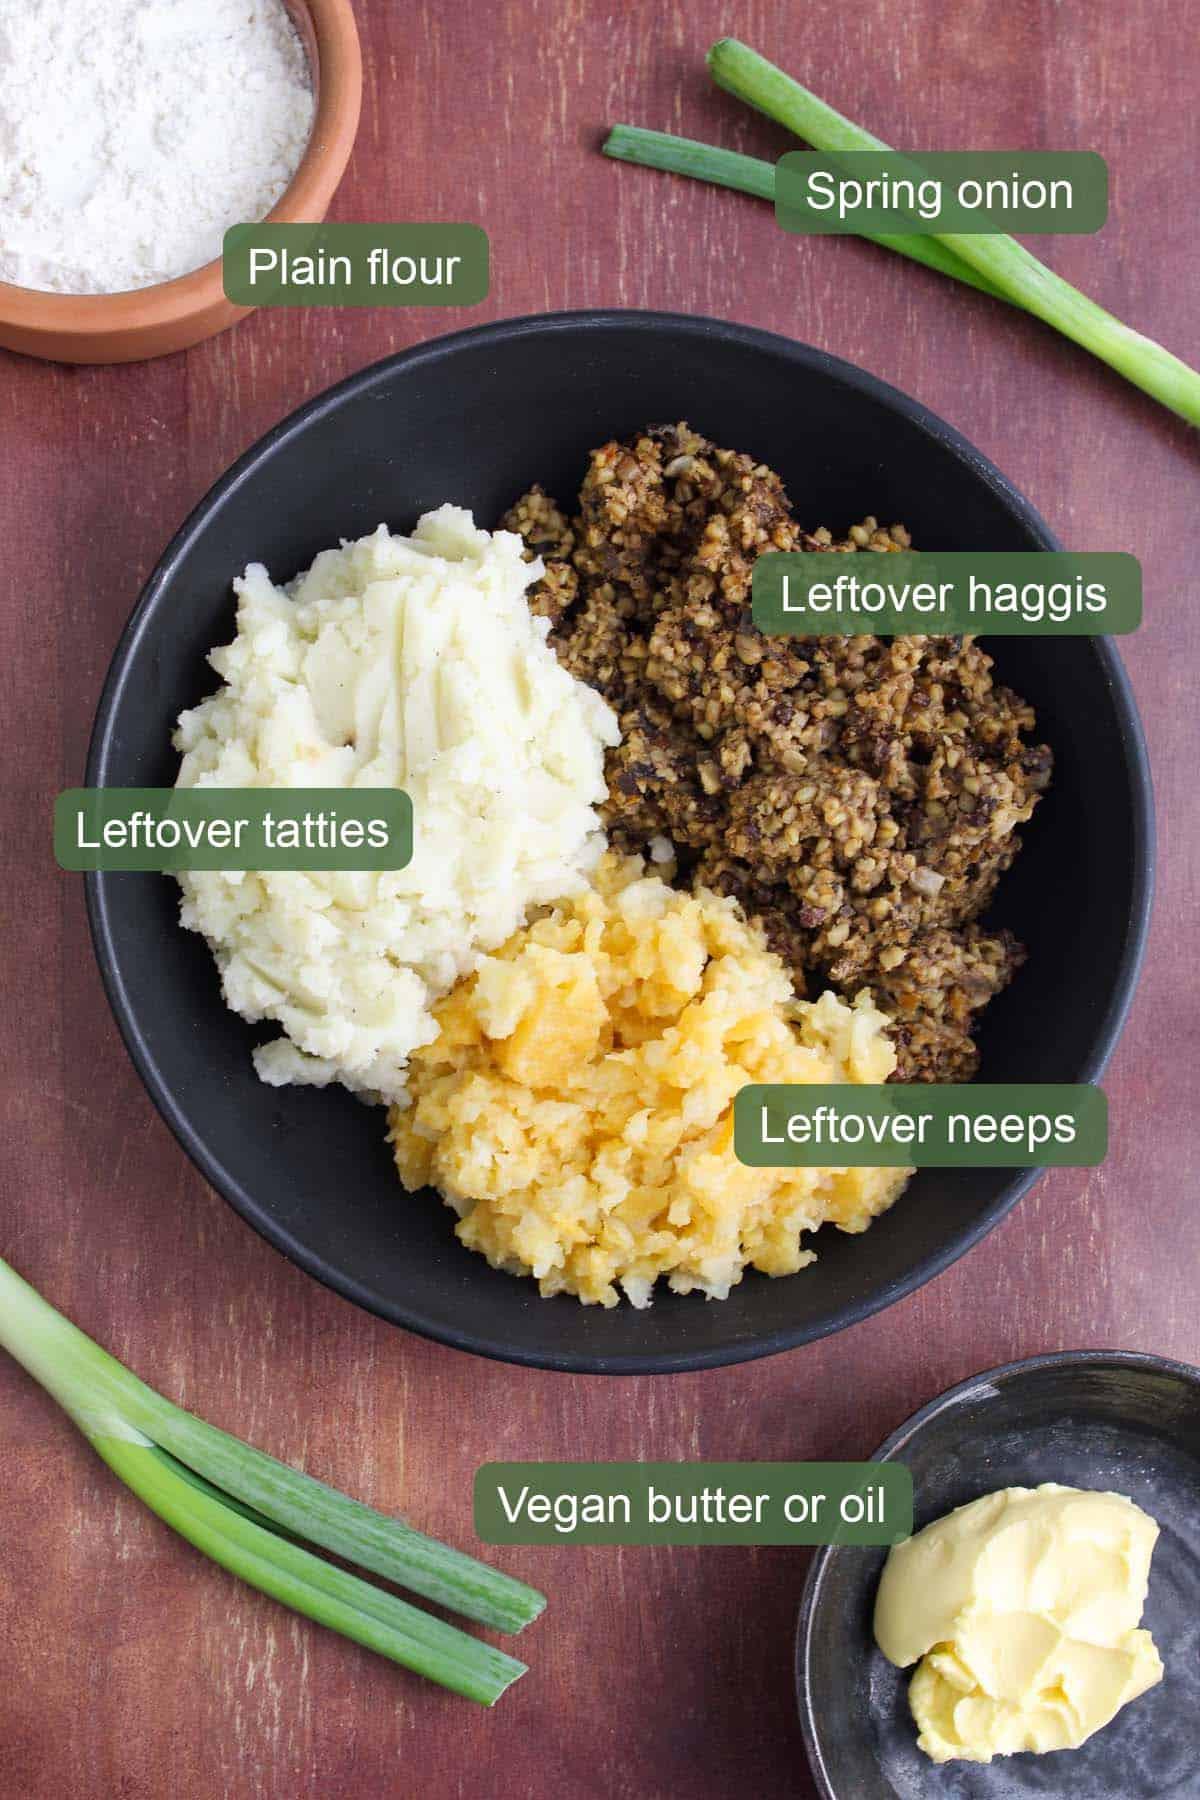 Ingredients to Make Leftover Vegan Haggis Fritters